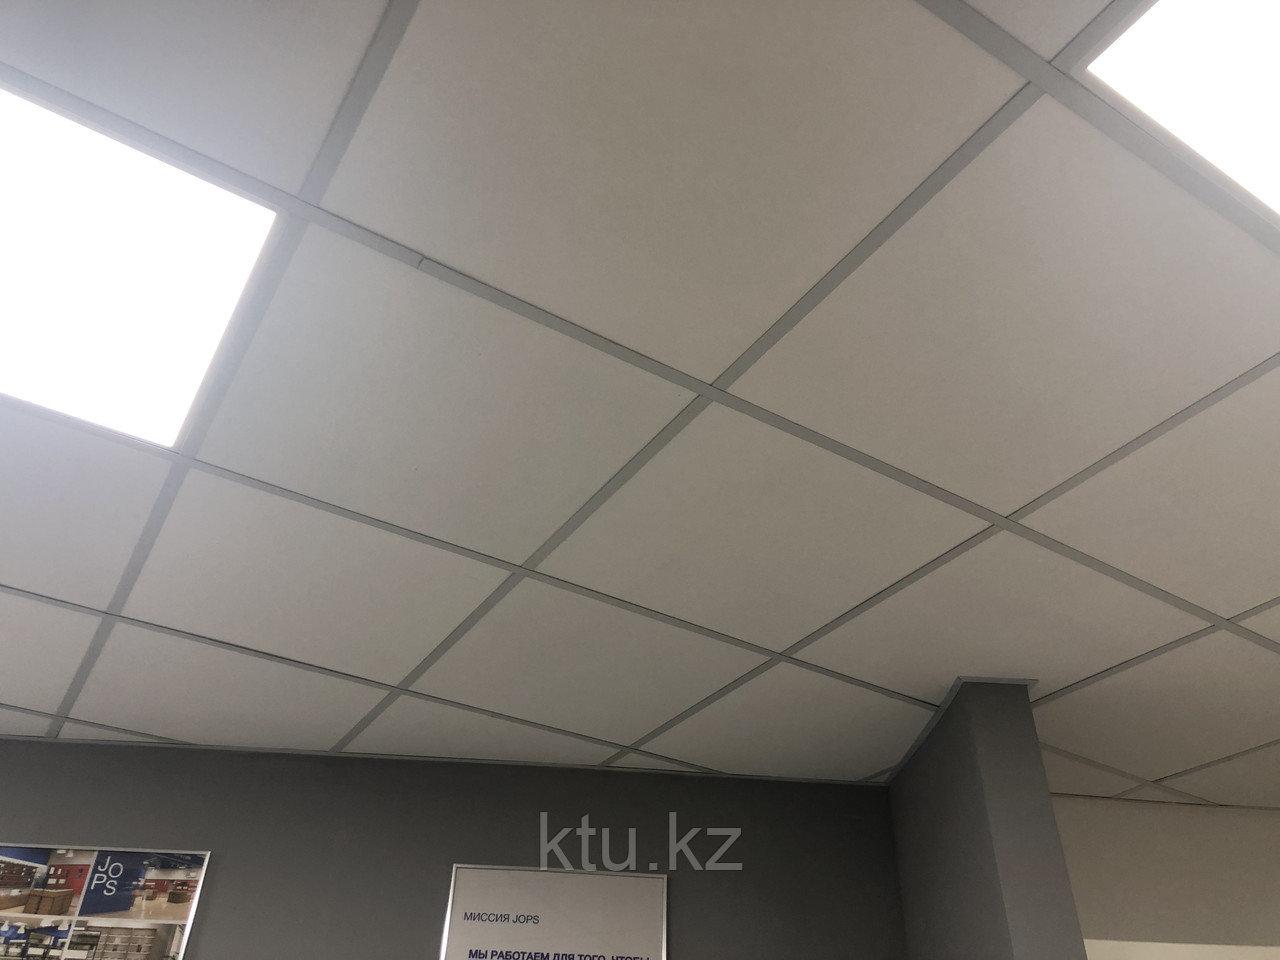 Подвесной потолок армстронг Retail Kazakhstan - фото 3